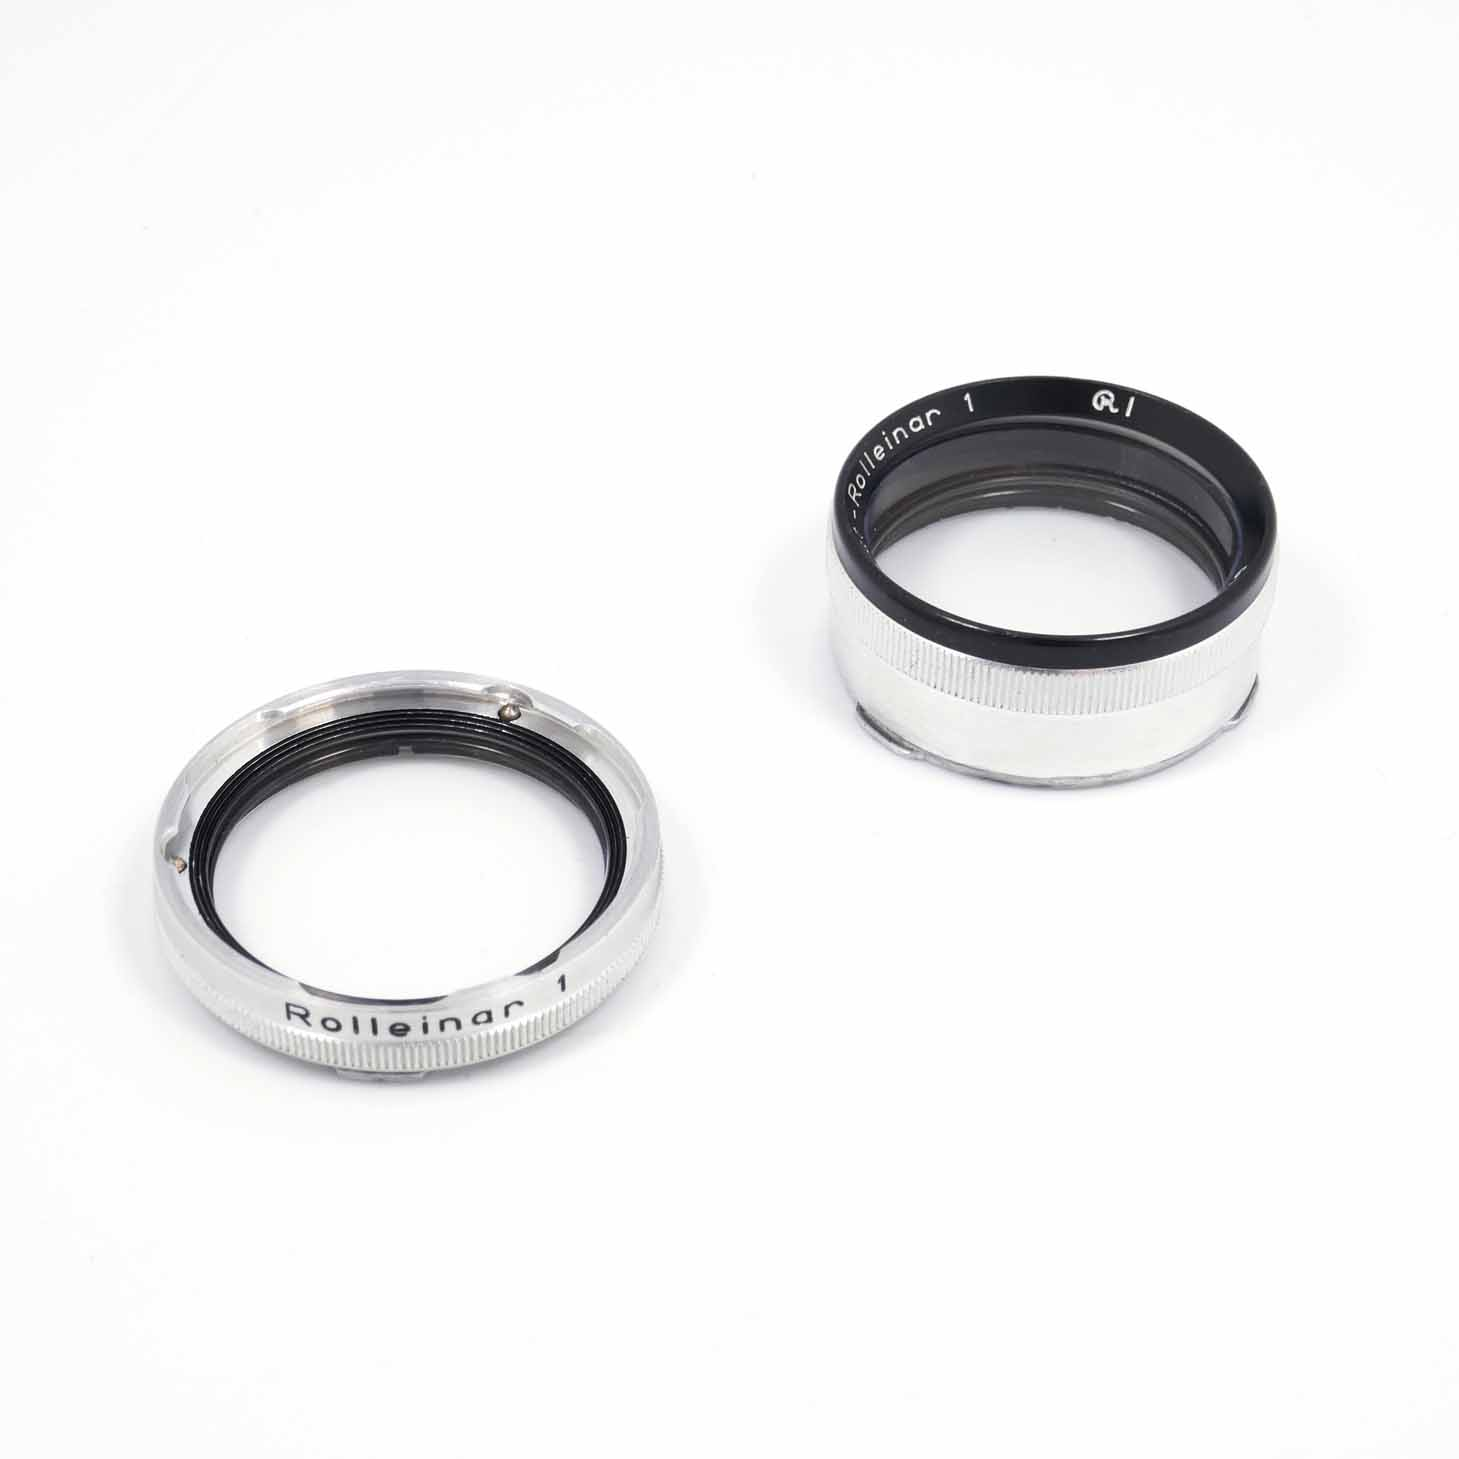 clean-cameras-Rolleinar-1-Bajonett-I-01